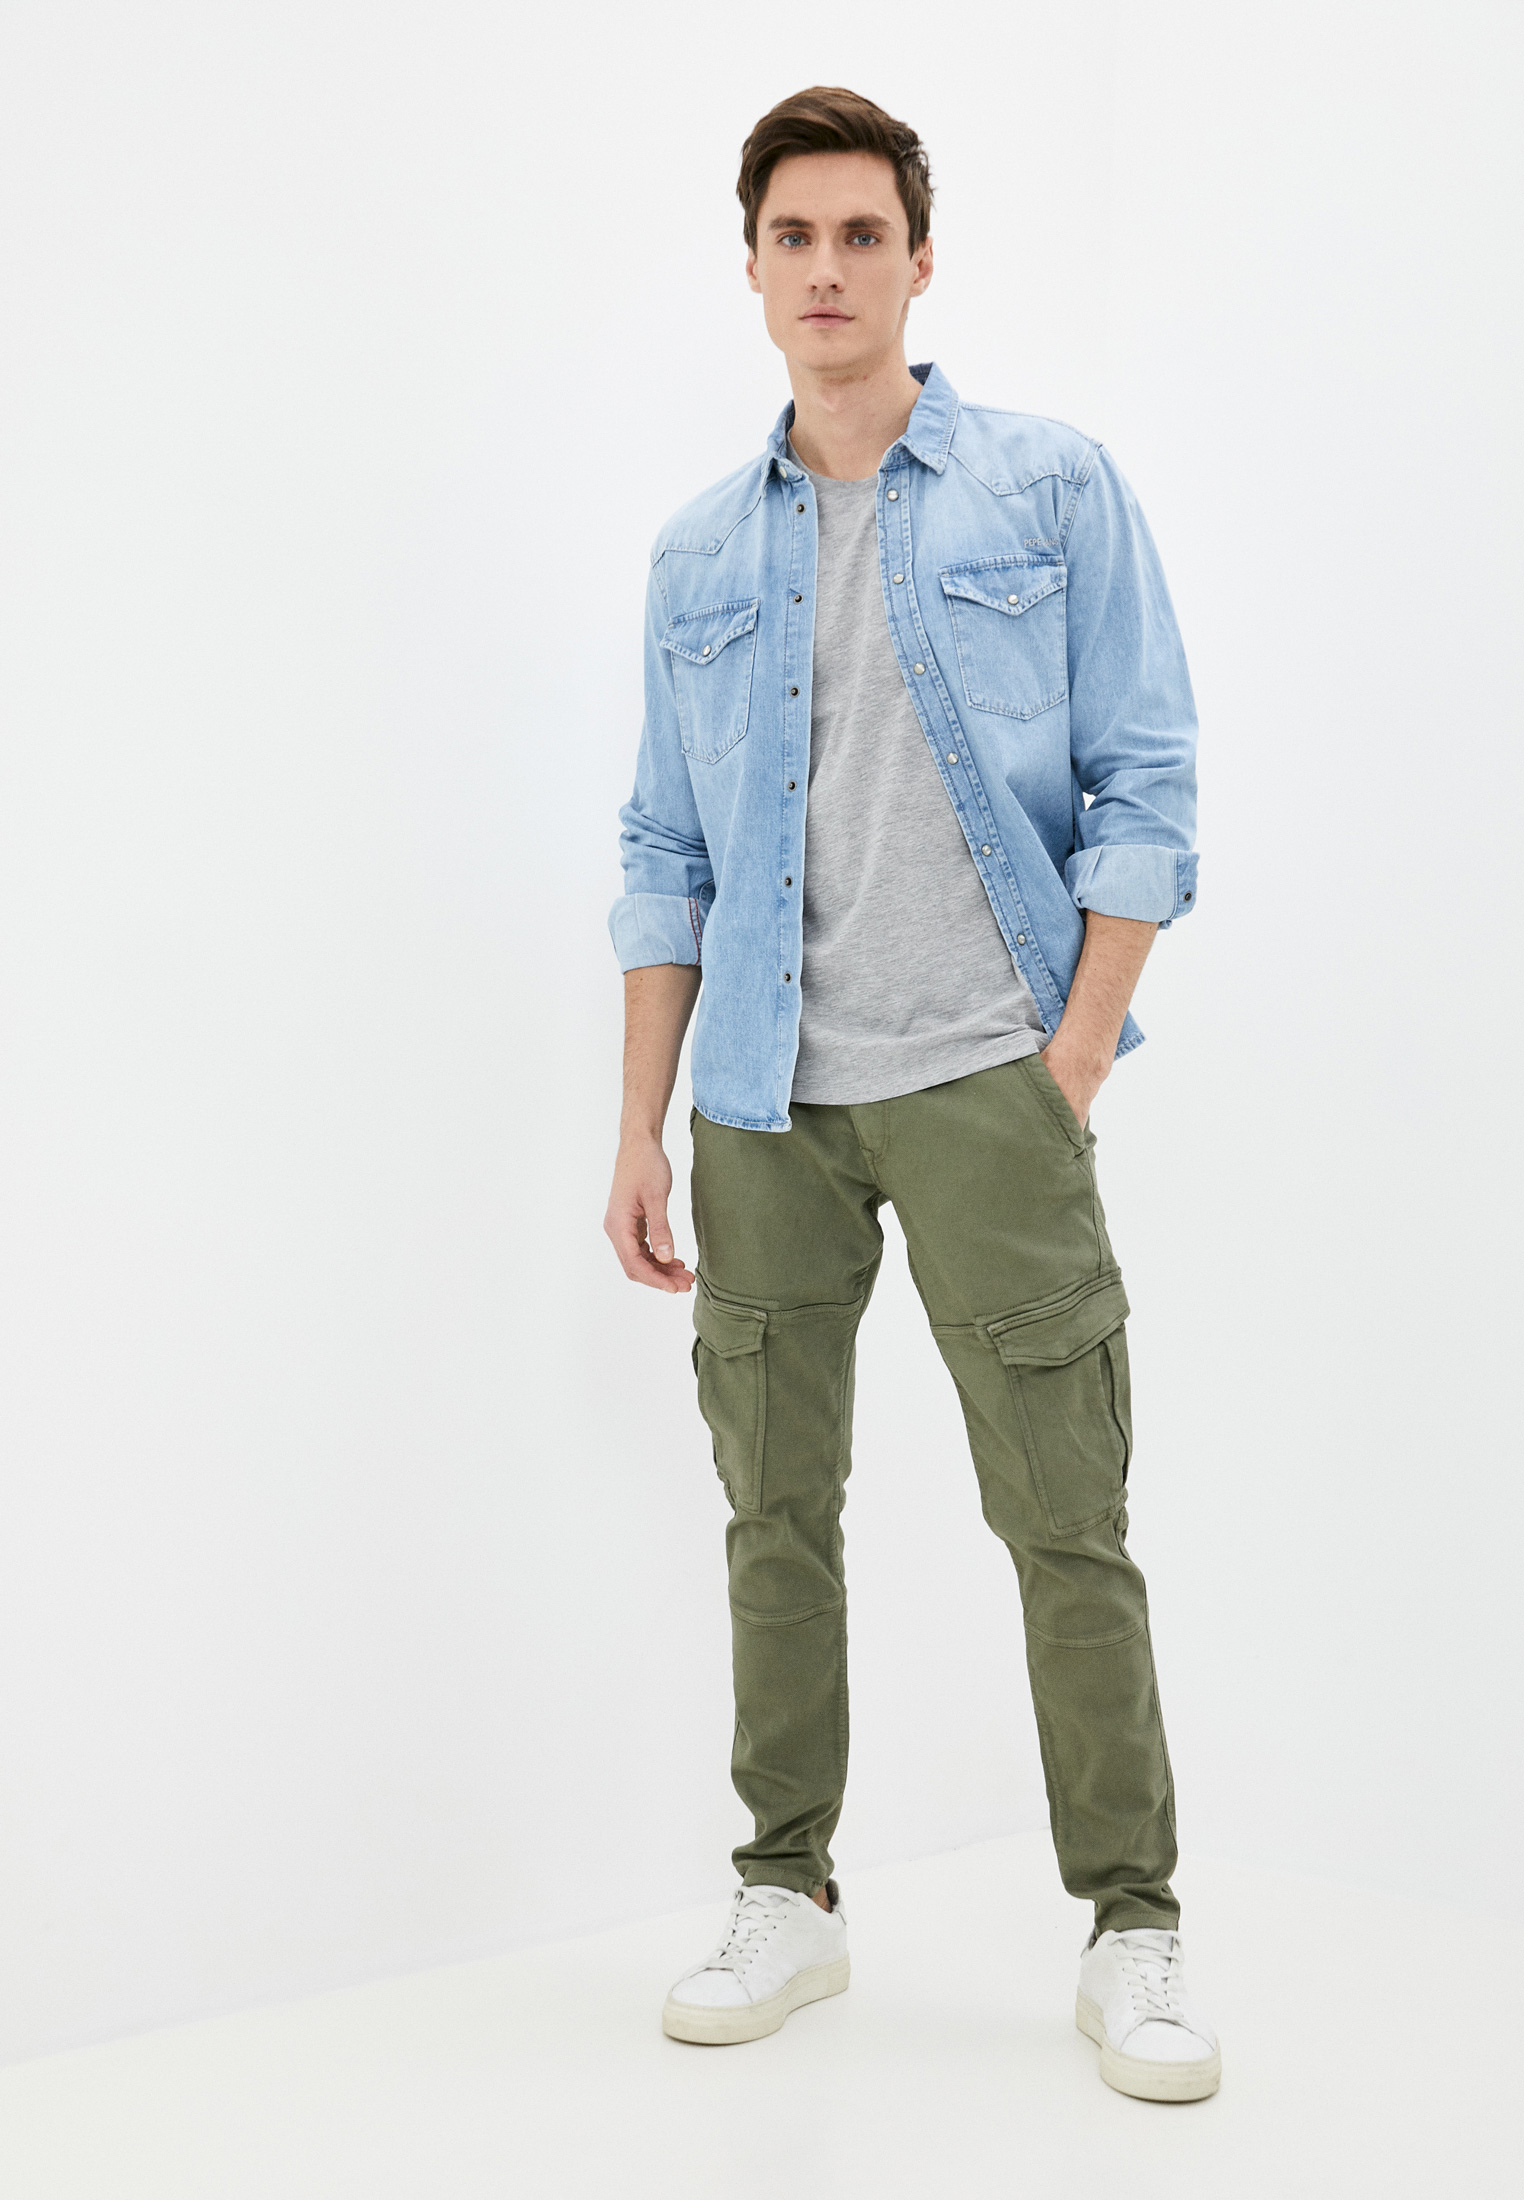 Рубашка Pepe Jeans (Пепе Джинс) PM307018: изображение 2